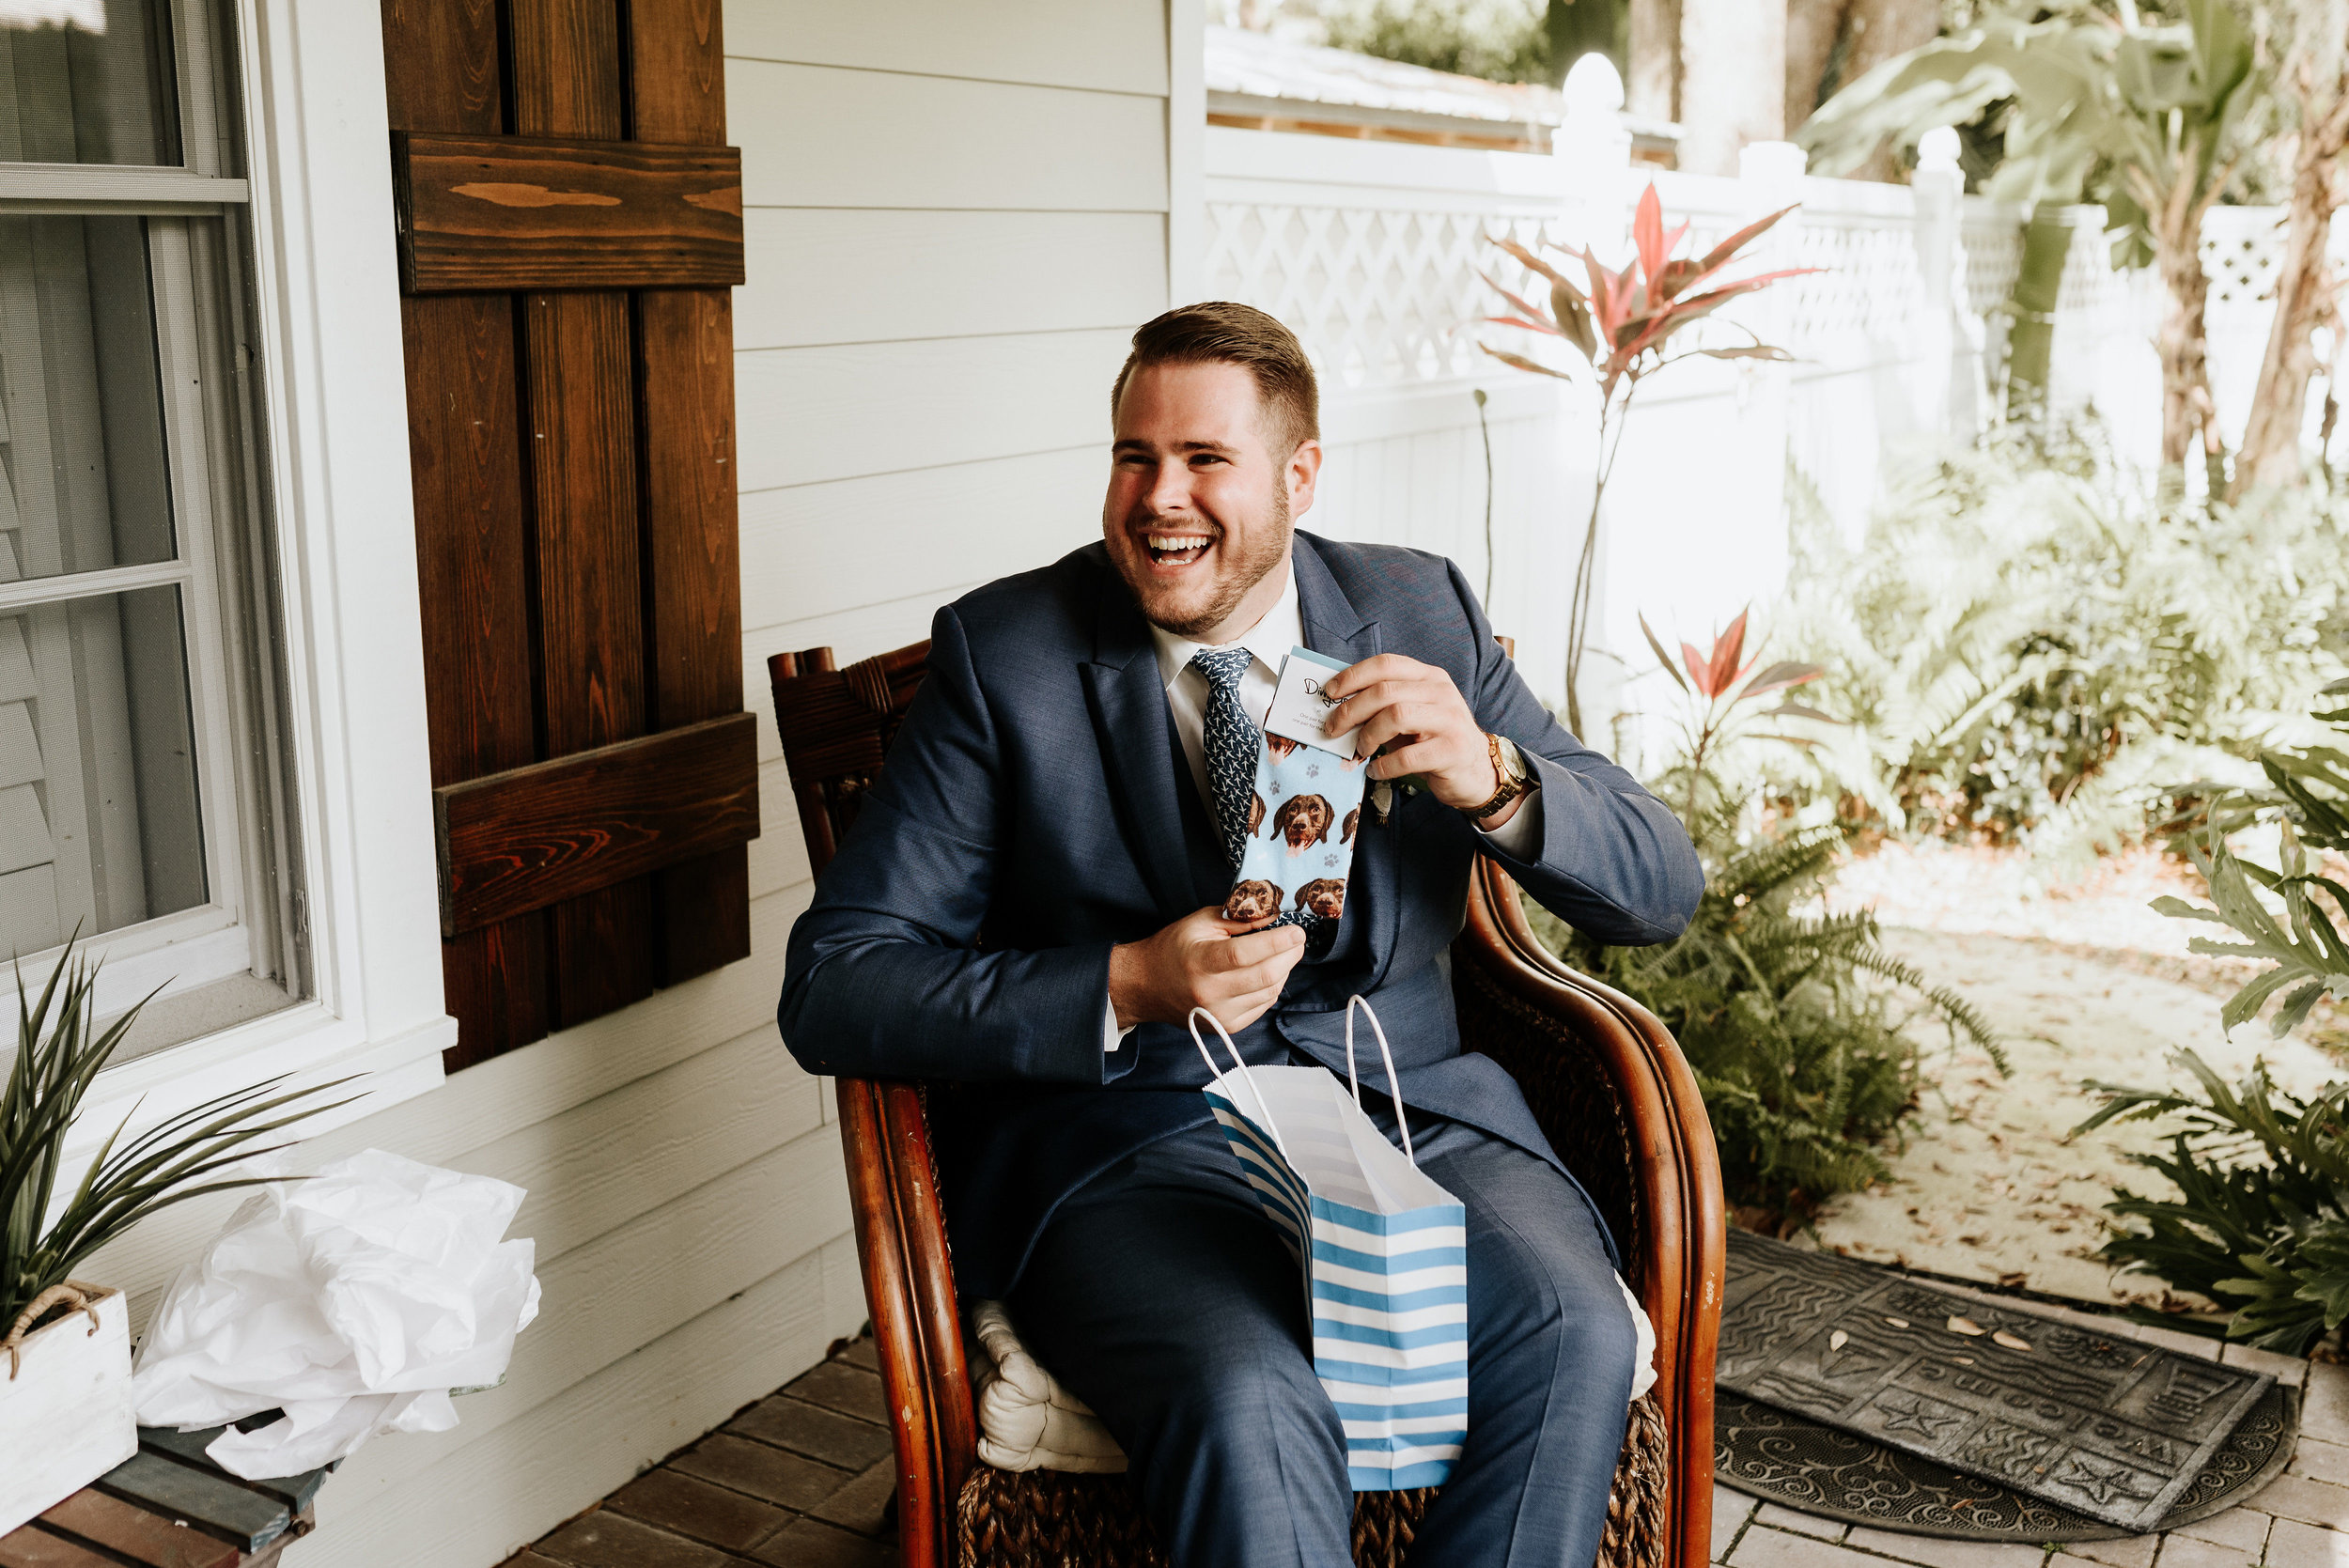 Mikenzi_Brad_Wedding_The_Delamater_House_New_Smyrna_Beach_Florida_Photography_by_V_9776.jpg